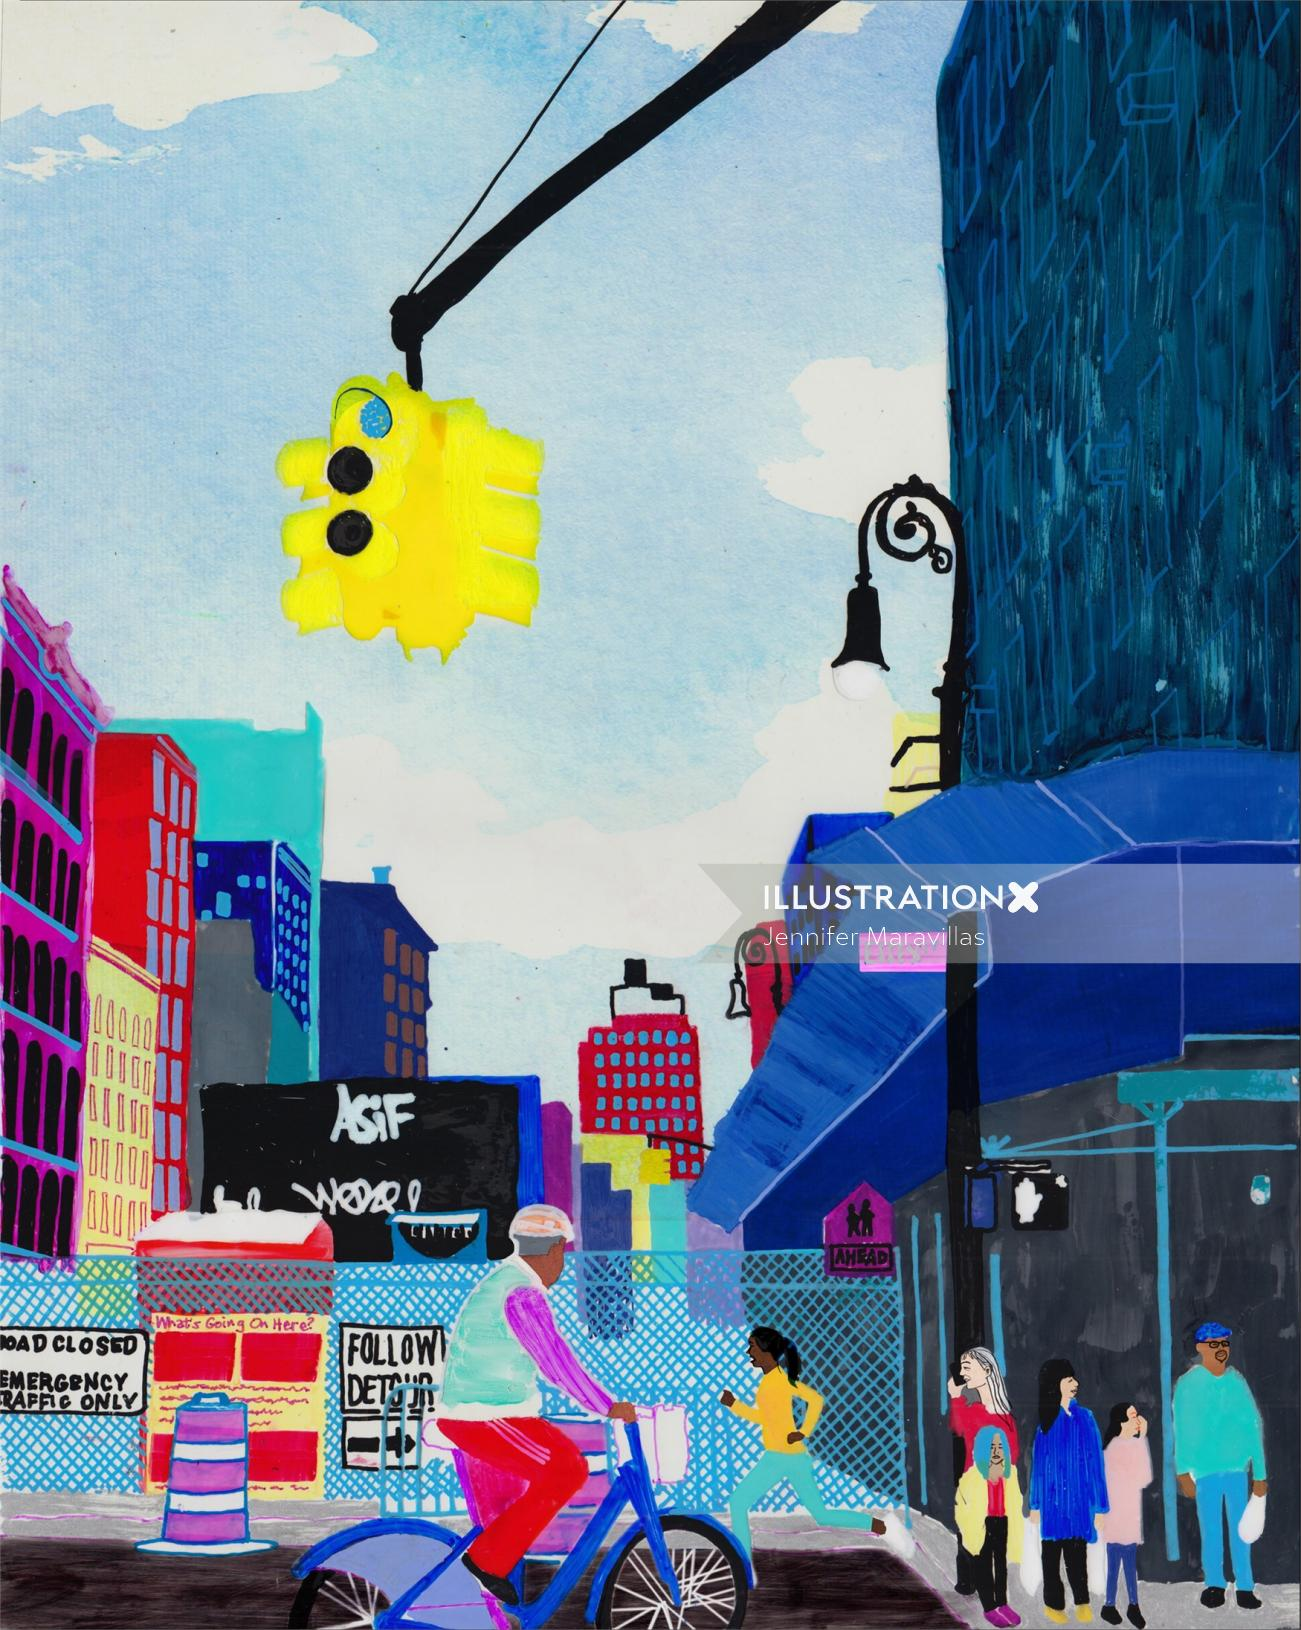 An illustration of street